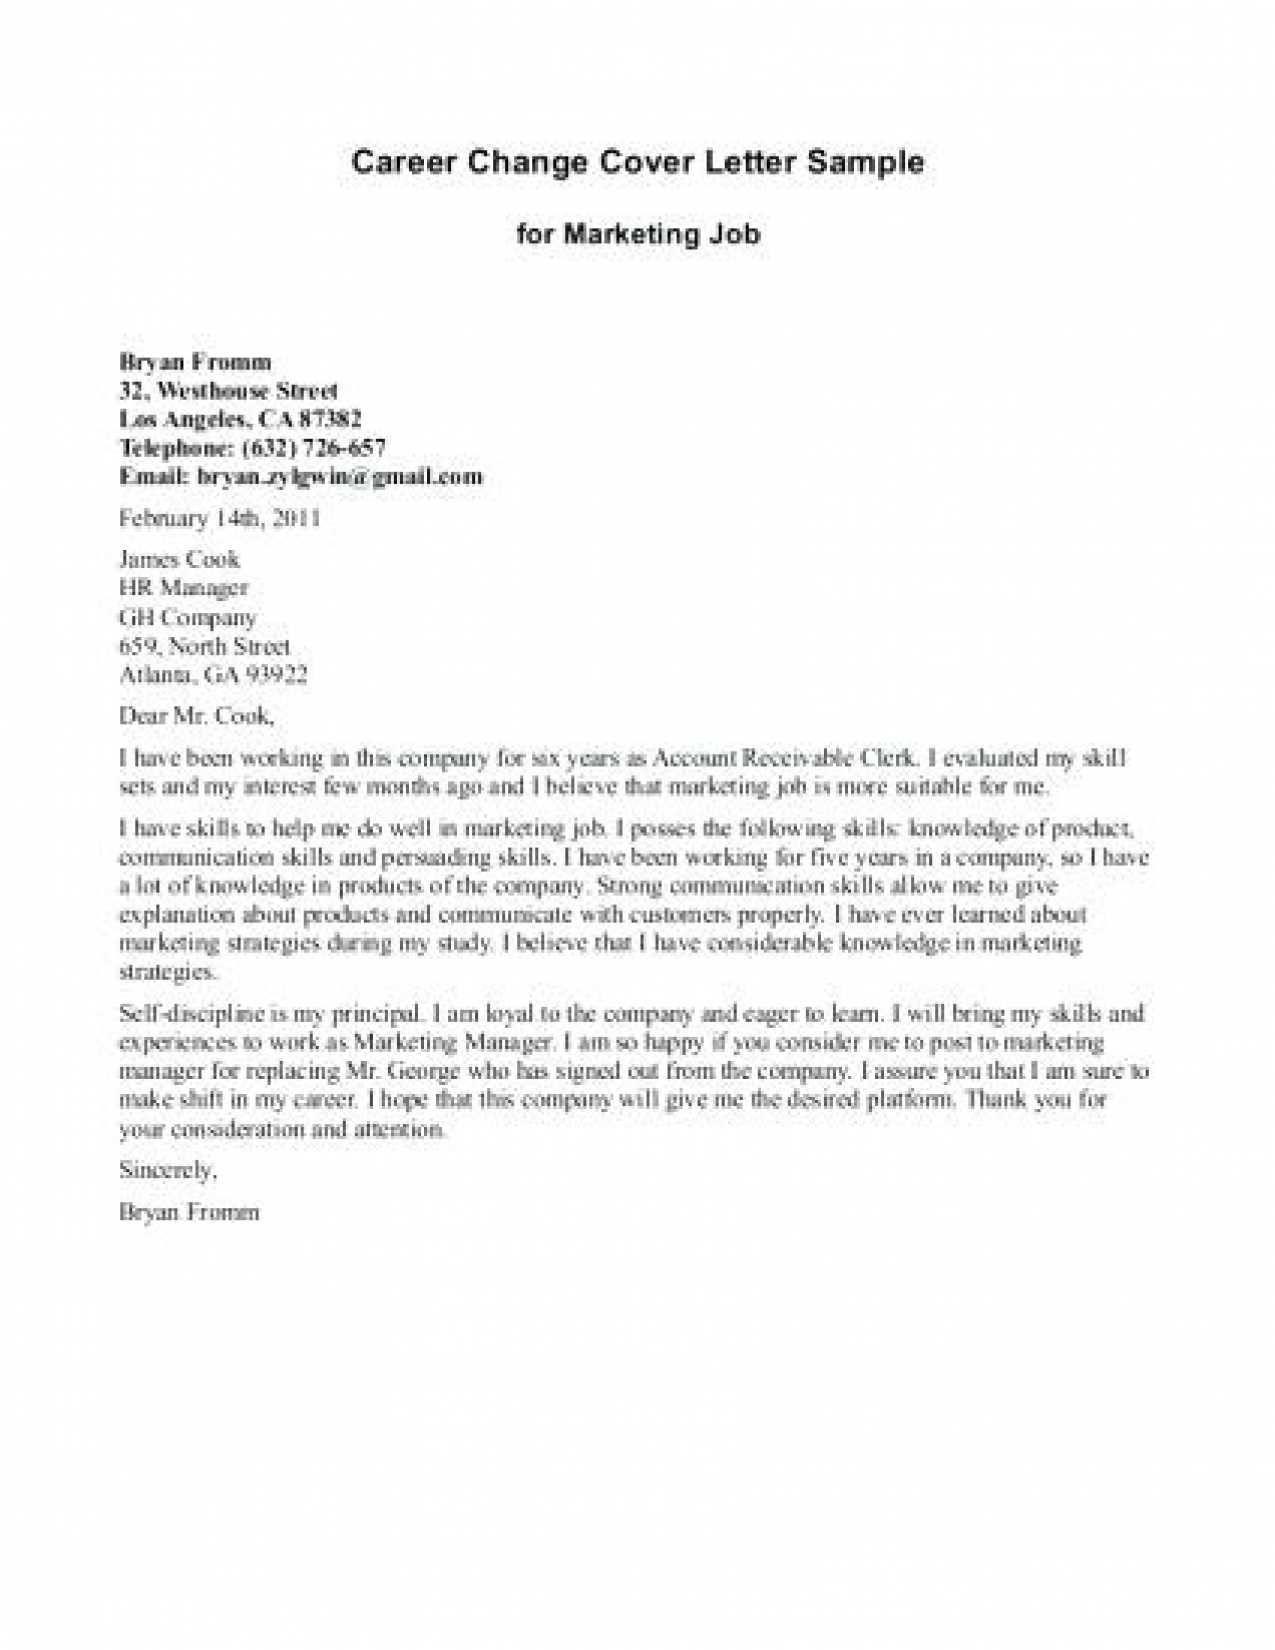 30+ Career Change Cover Letter (2020) Career change